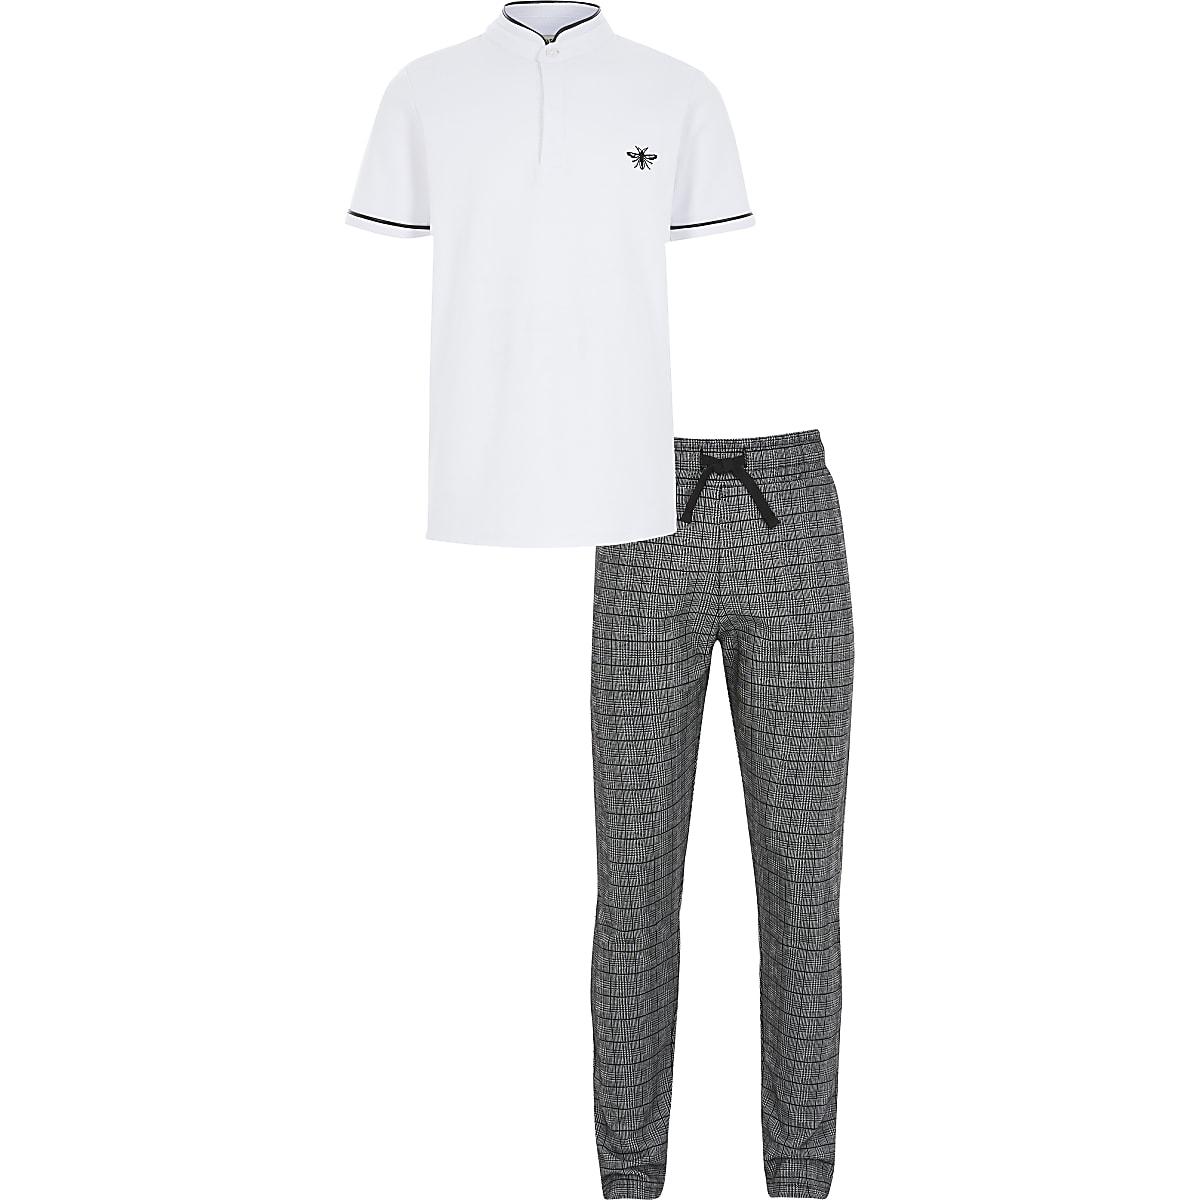 Boys white grandad collar polo shirt outfit